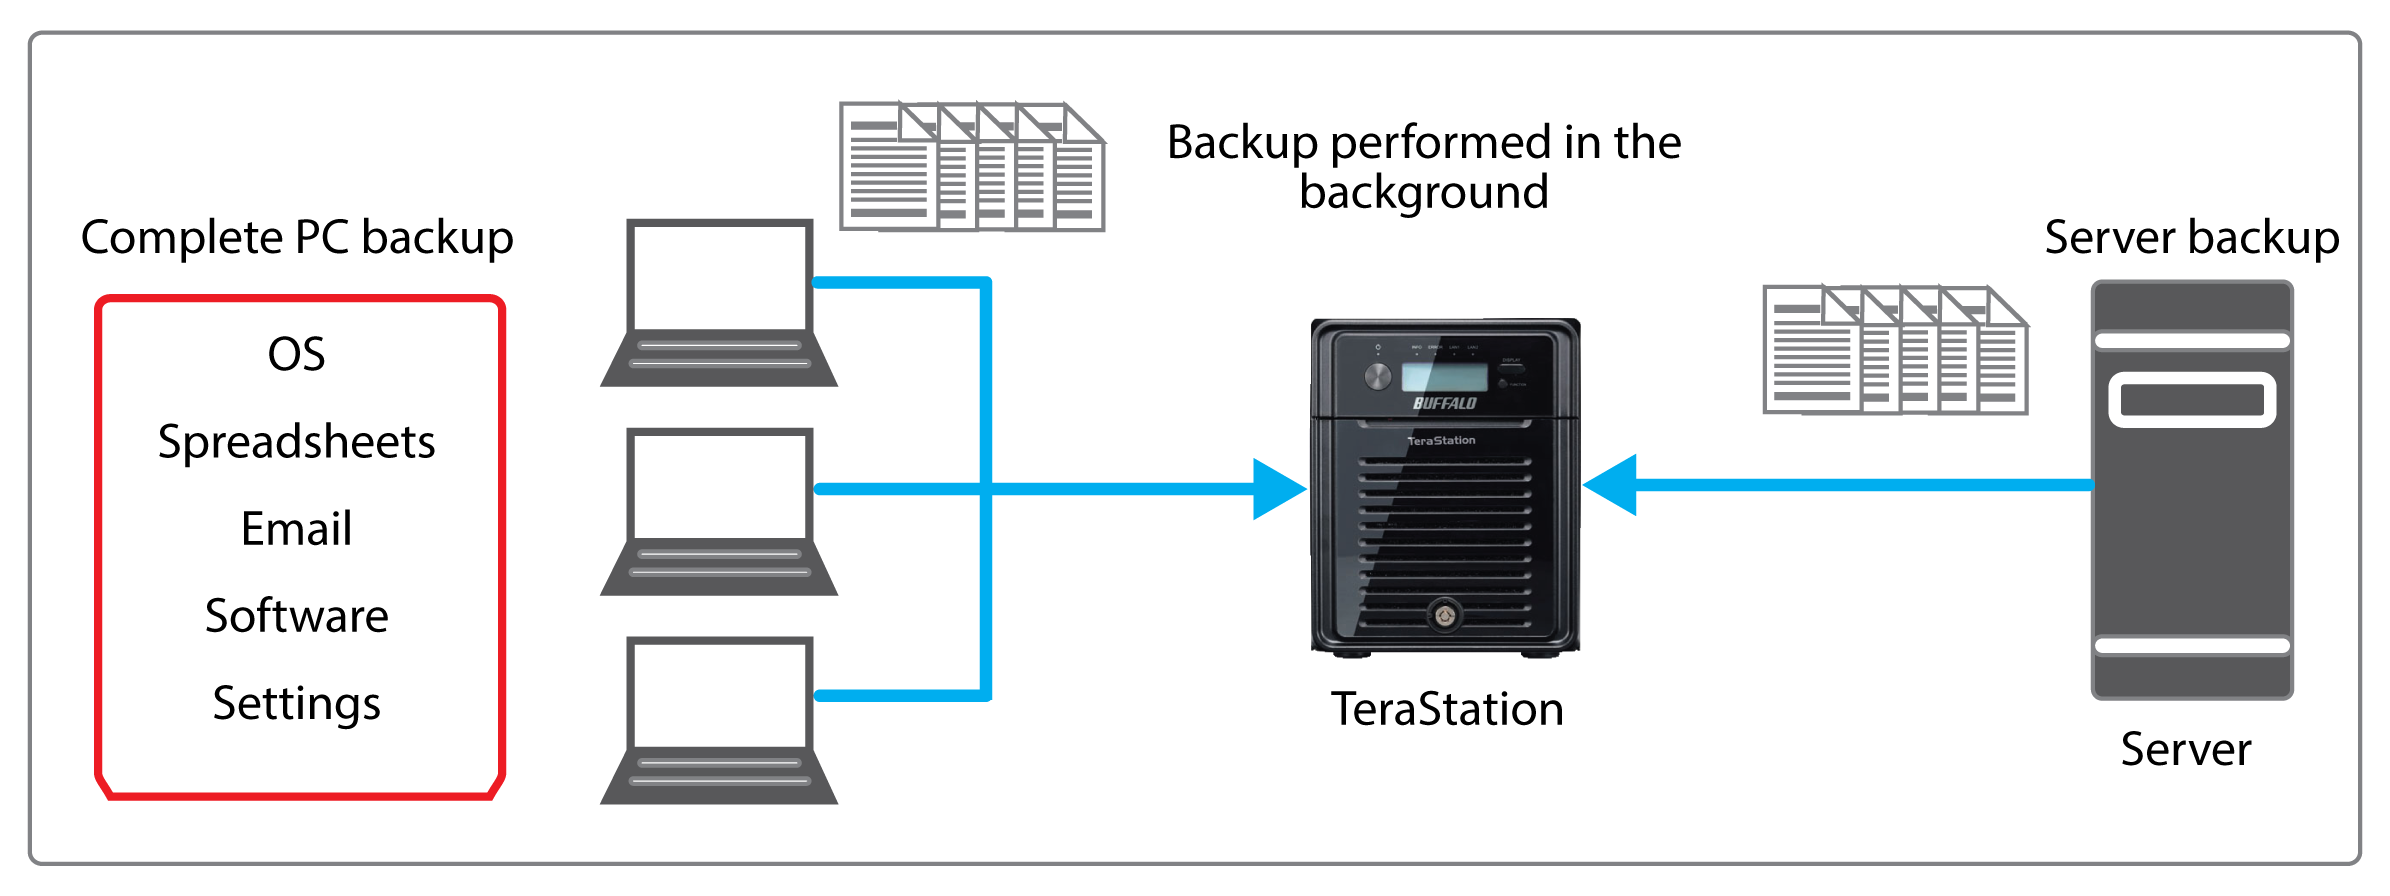 terastation 3000 data protection and backup